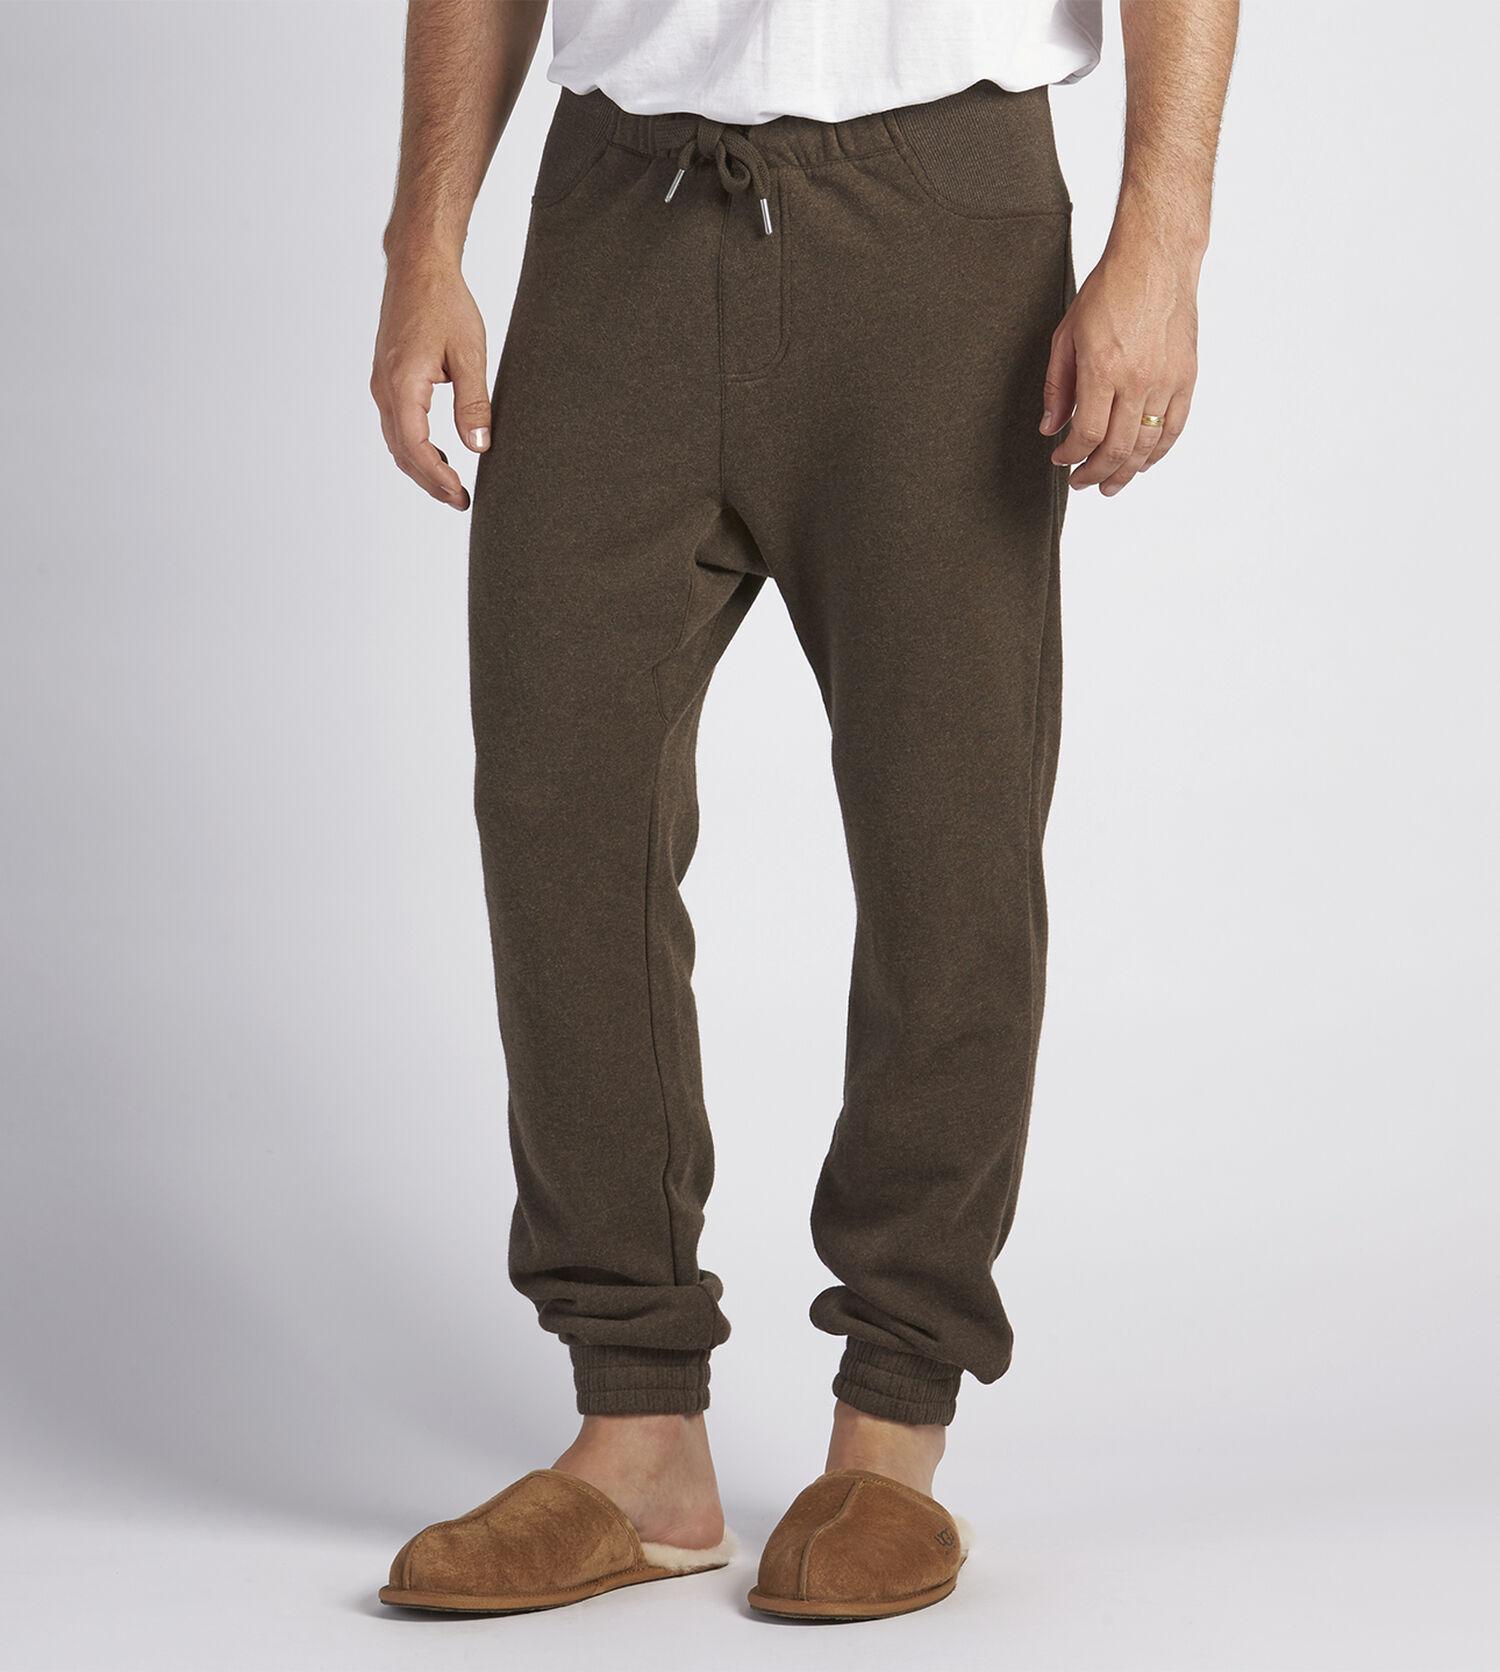 36c794fa436 Men's Share this product Ryan Jogger Pants